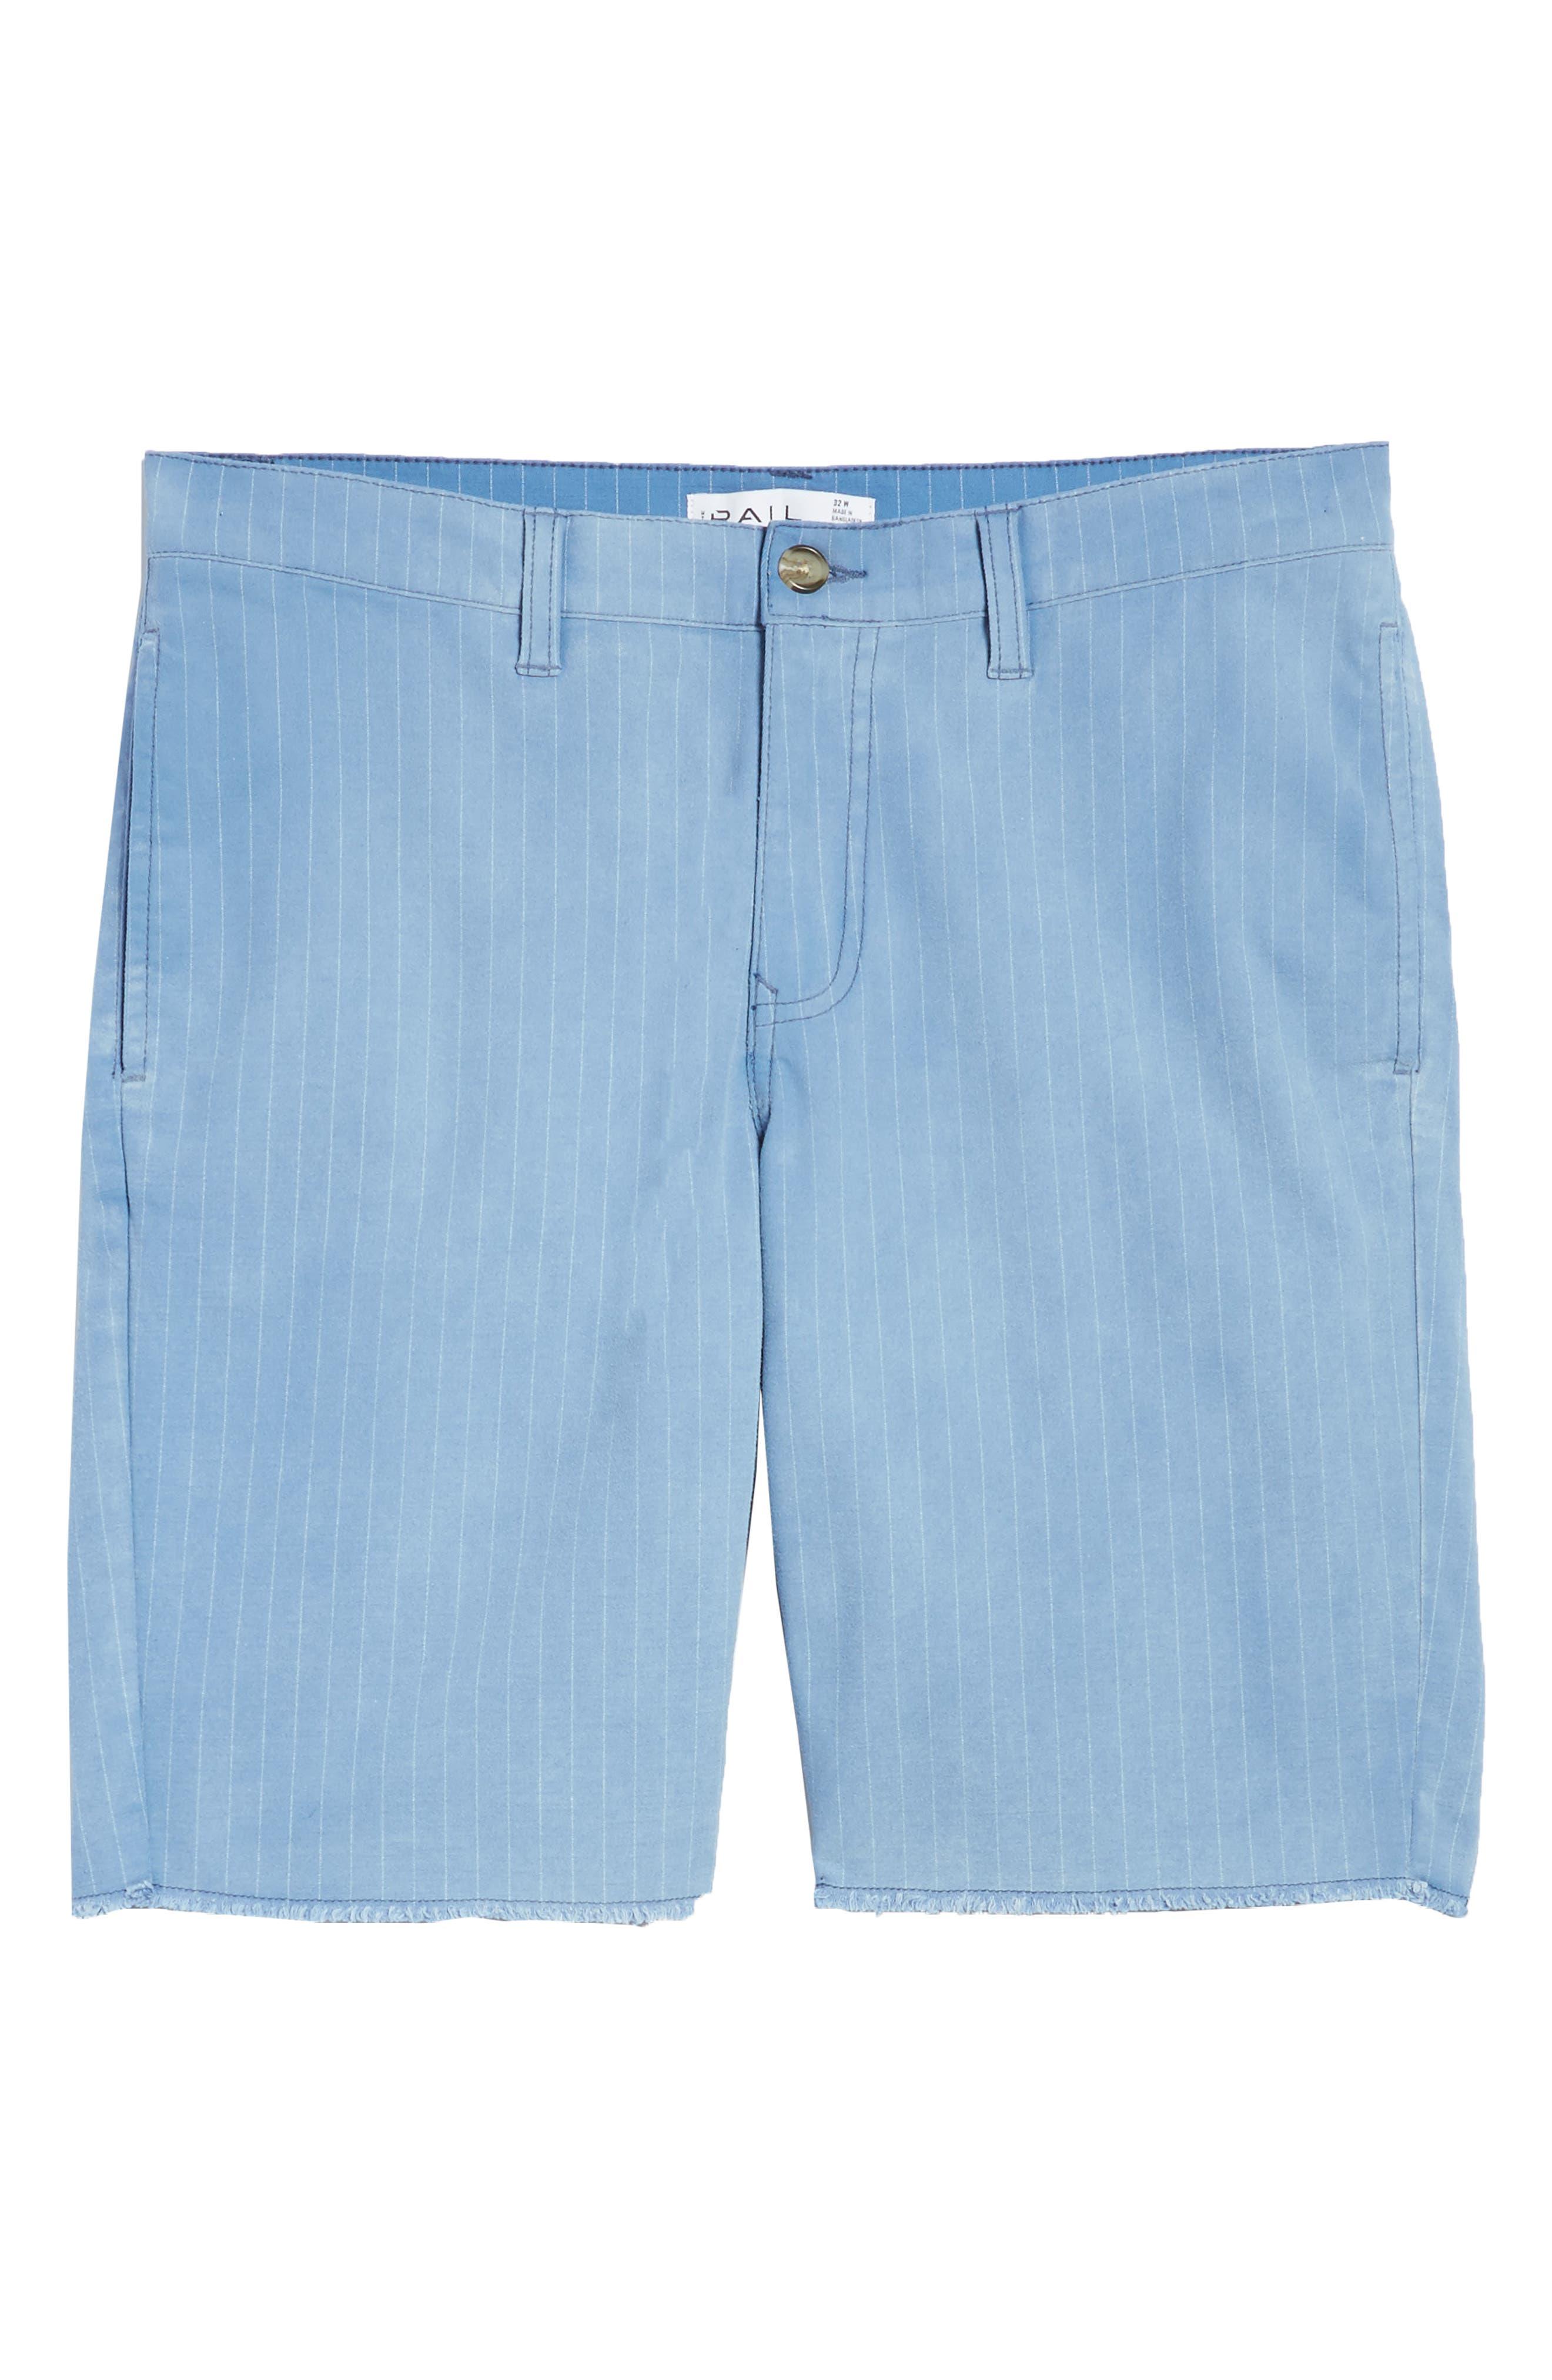 Print Frost Wash Shorts,                             Alternate thumbnail 6, color,                             Blue Camp Stripe